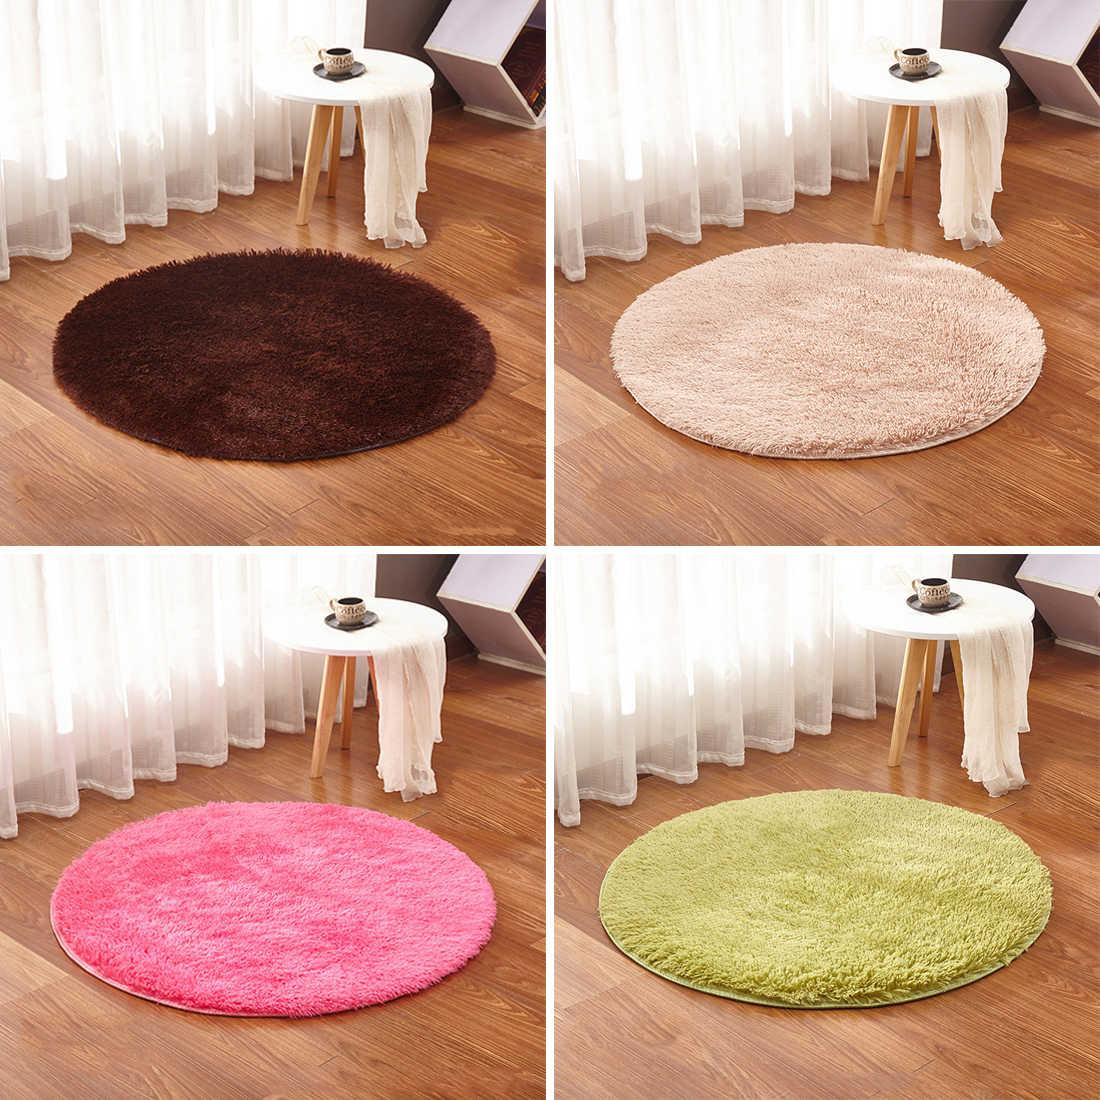 1pc Shaggy Area Rug Living Room Fluffy Round Rug Carpet For Kilim Faux Fur Carpet Kids Room Long Plush Rugs For Bedroom